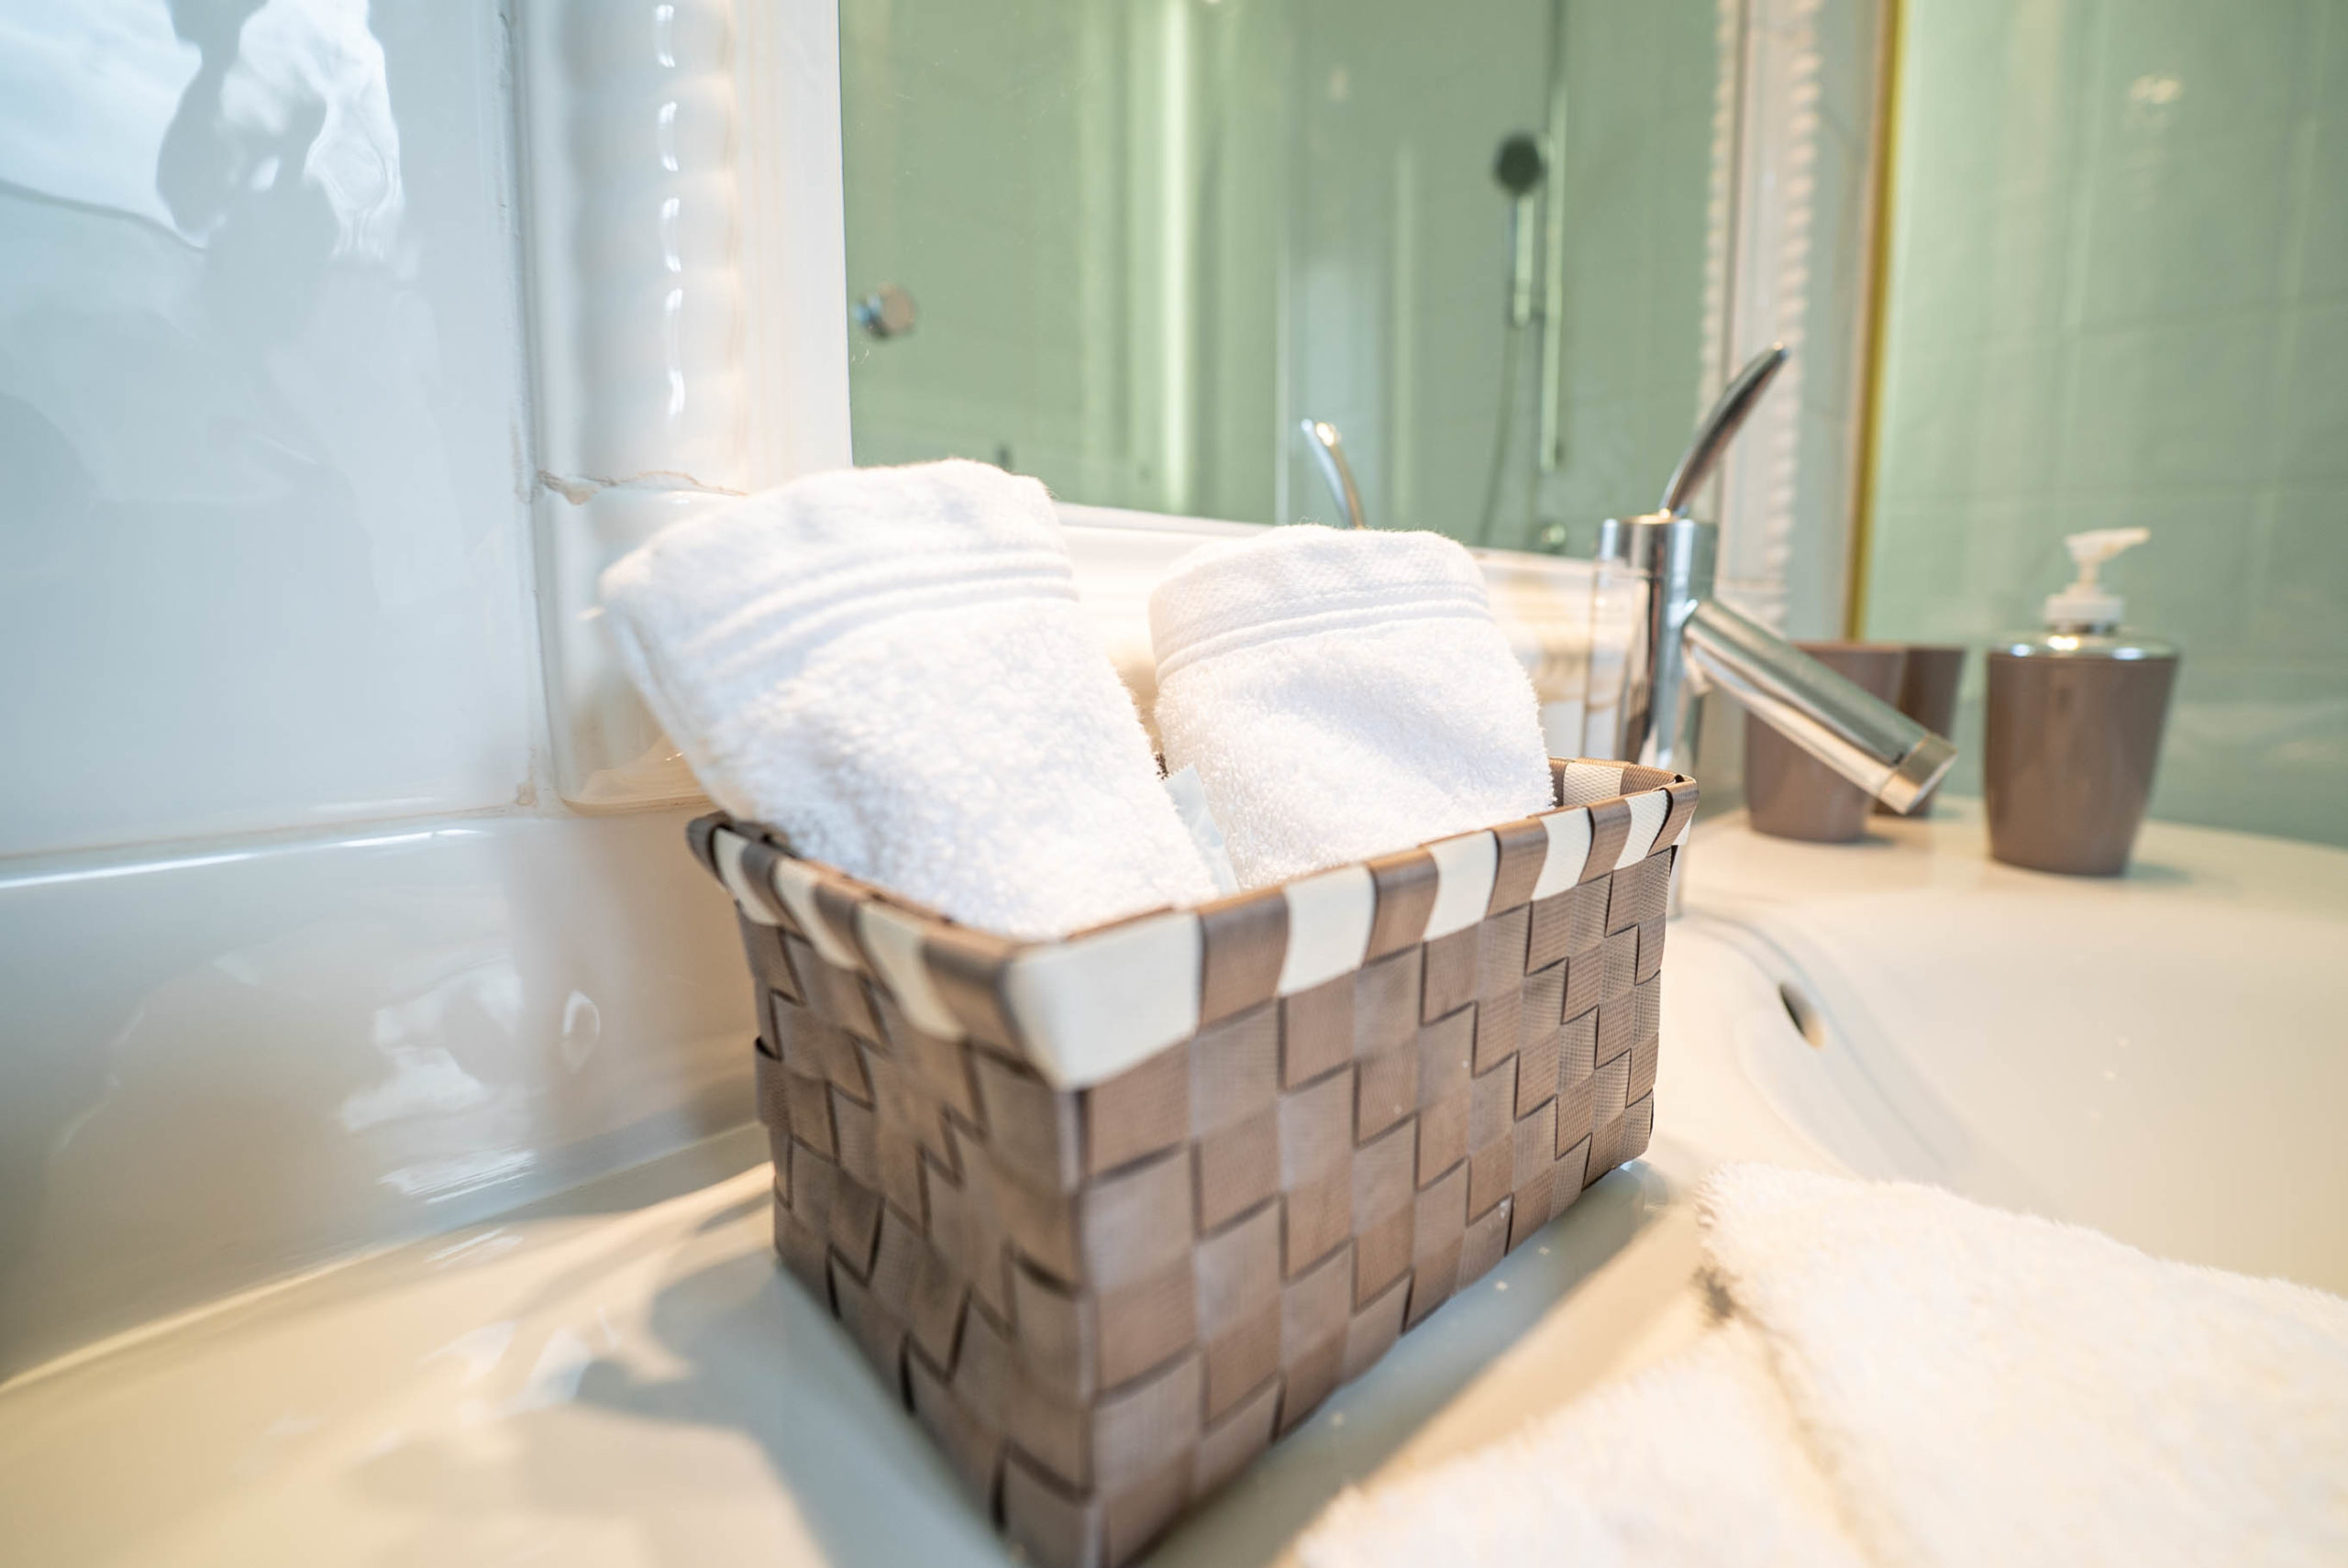 Salle de bain serviettes chateau Rauly location bergerac Monbazillac